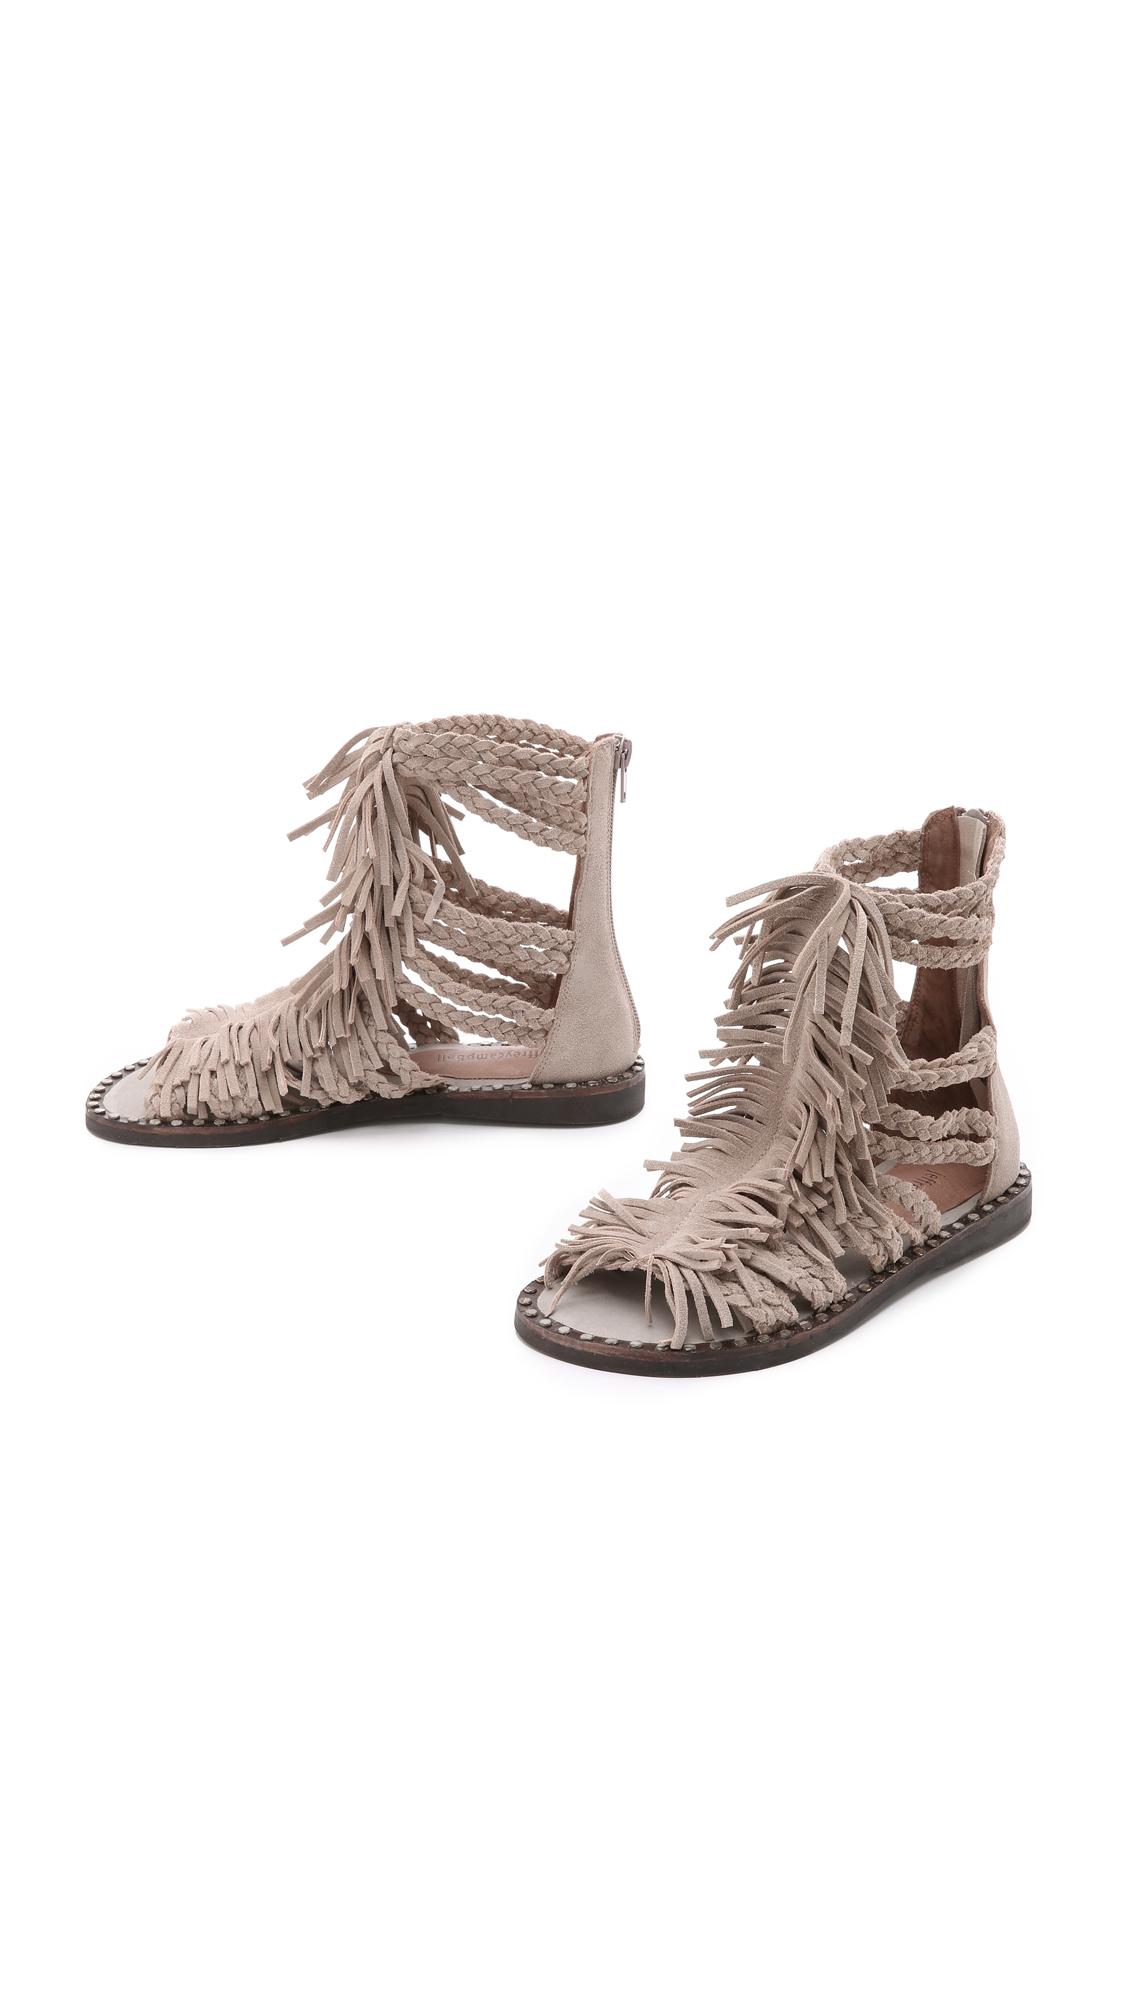 d5b4d8e0334c Jeffrey Campbell Santana Fringe Sandals